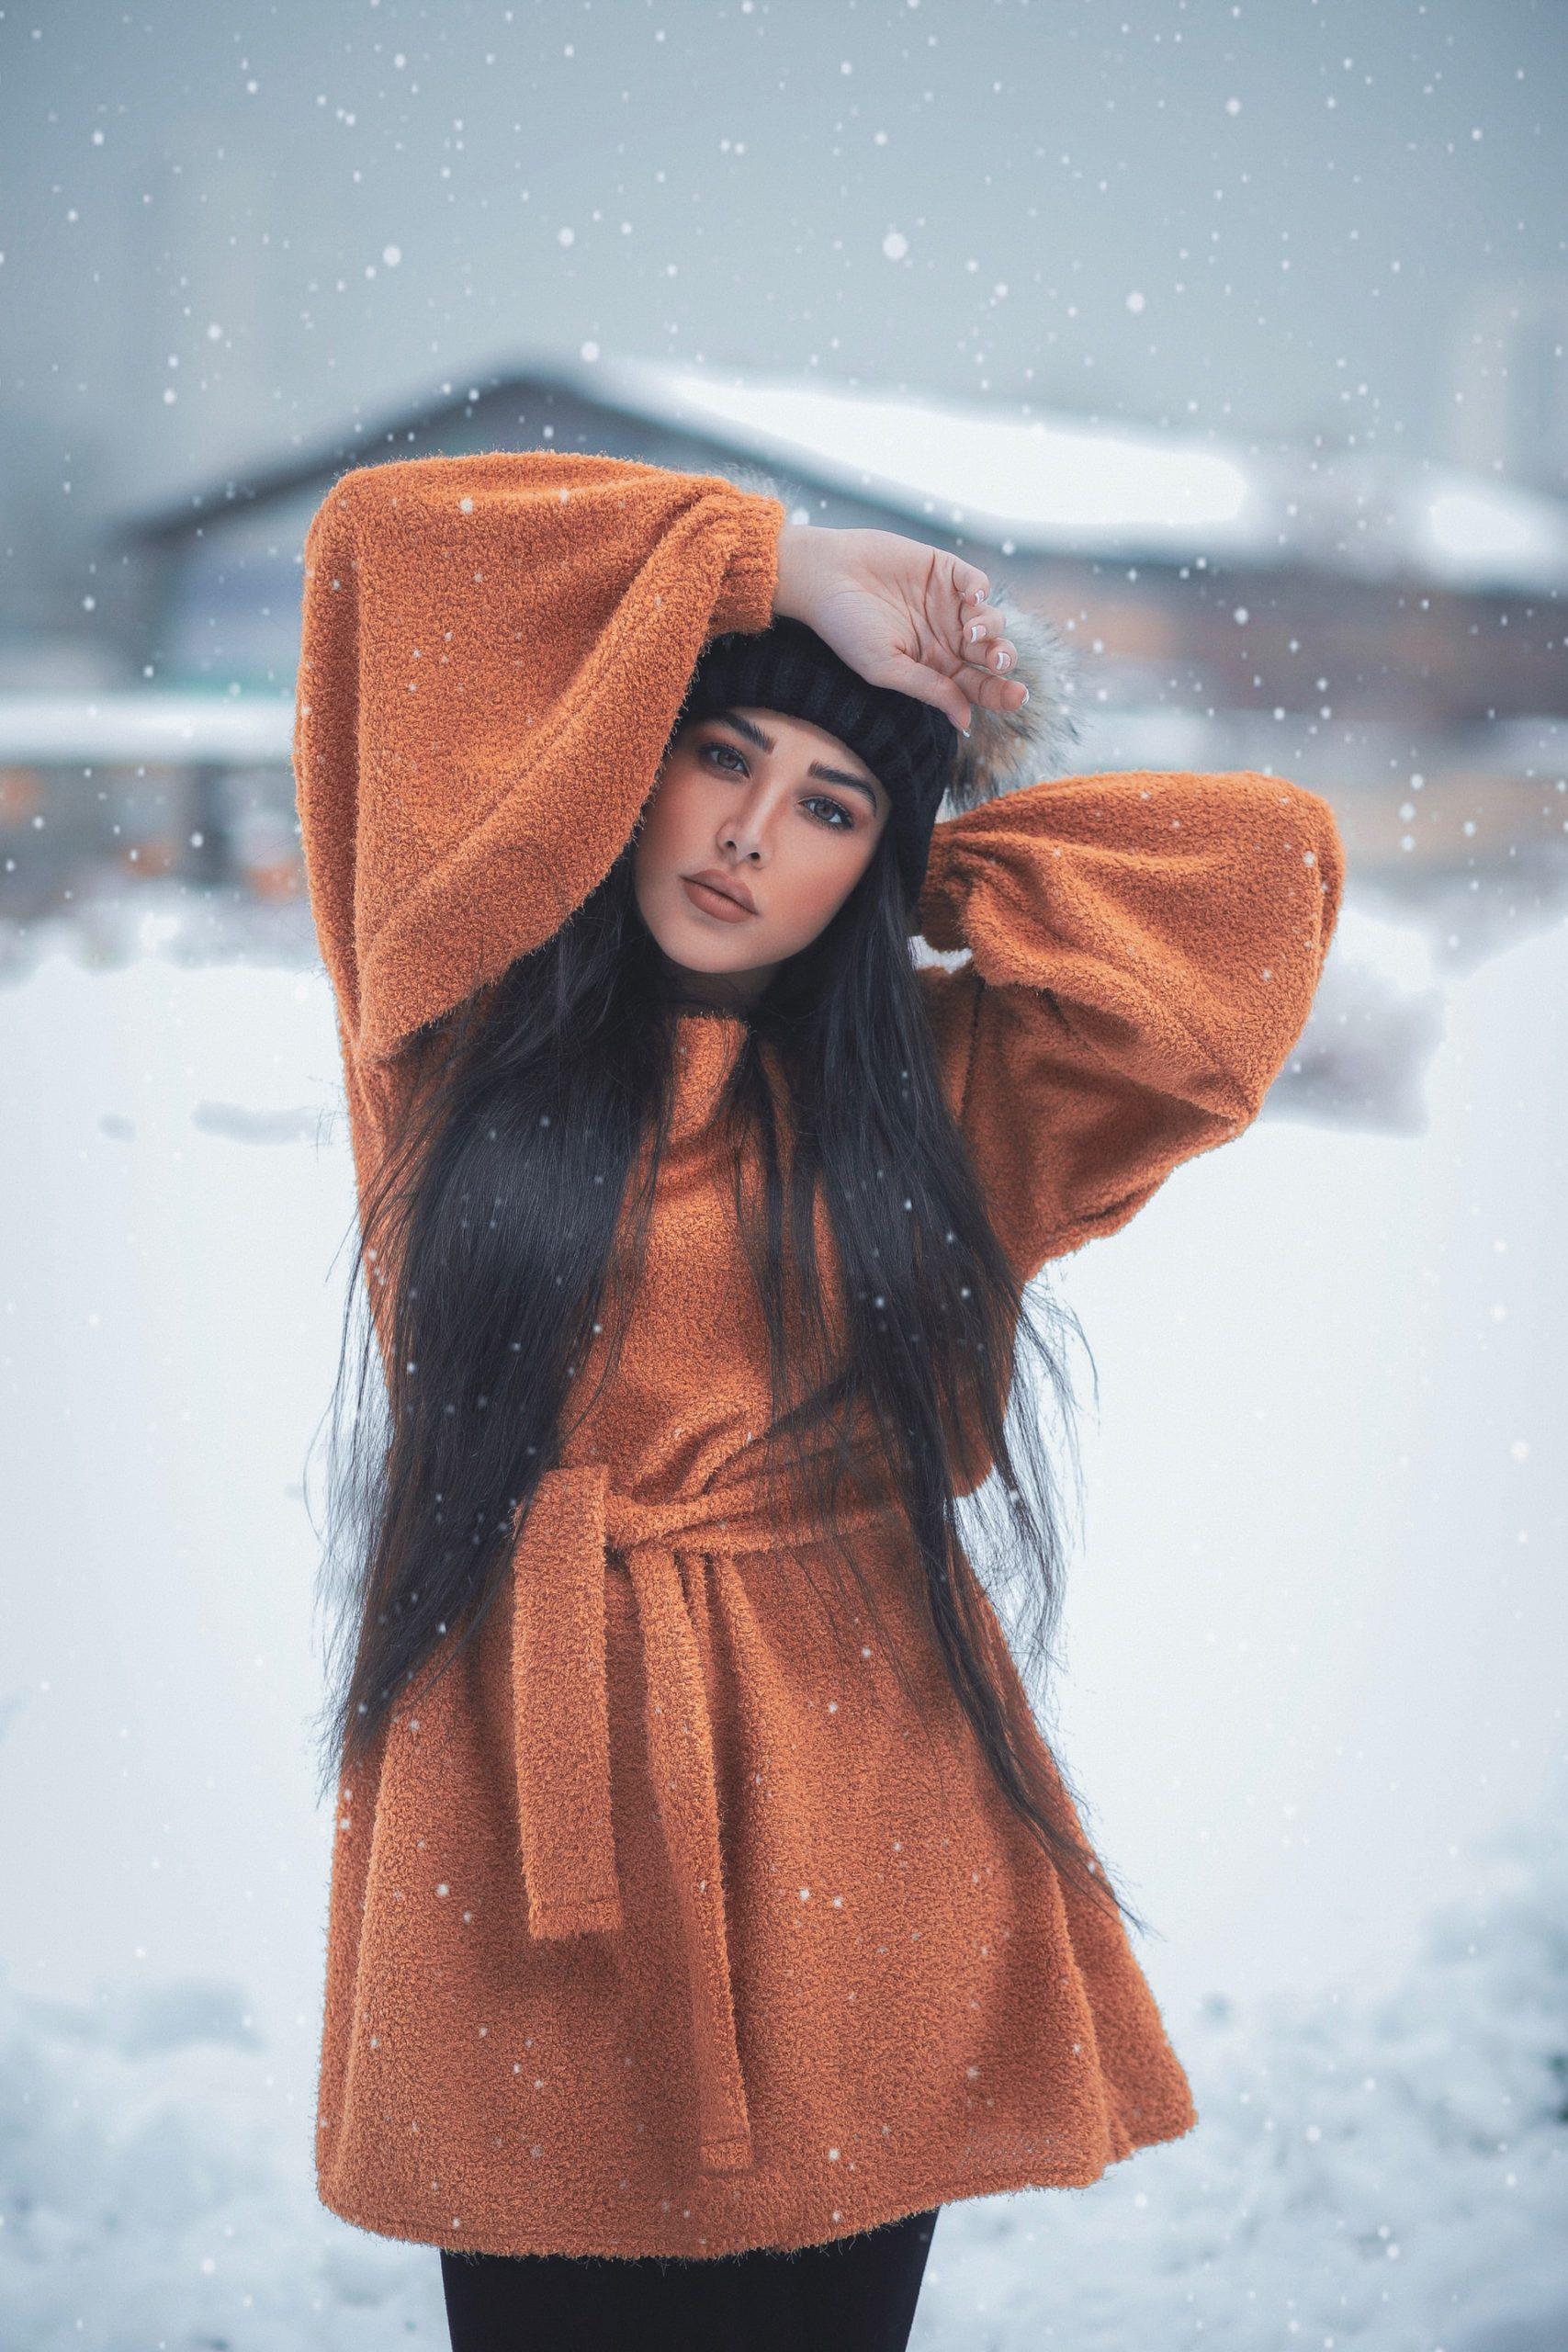 2020 Fashion Styles Winter Season Article Image